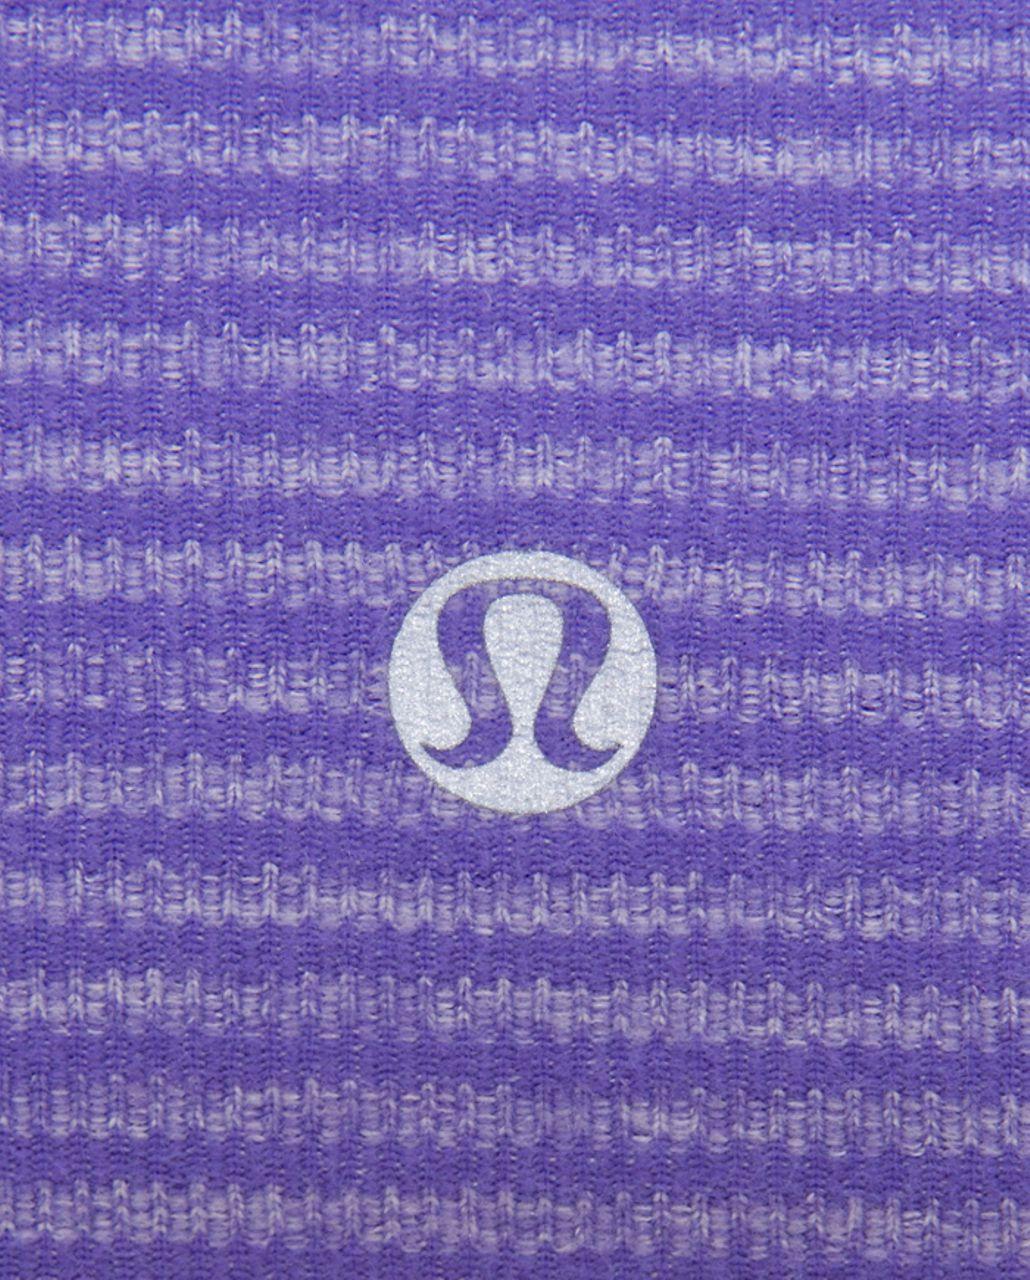 Lululemon Run: Turn Around Long Sleeve - Persian Purple Heathered Persian Mini Check /  Reflective Sparkle Splatter